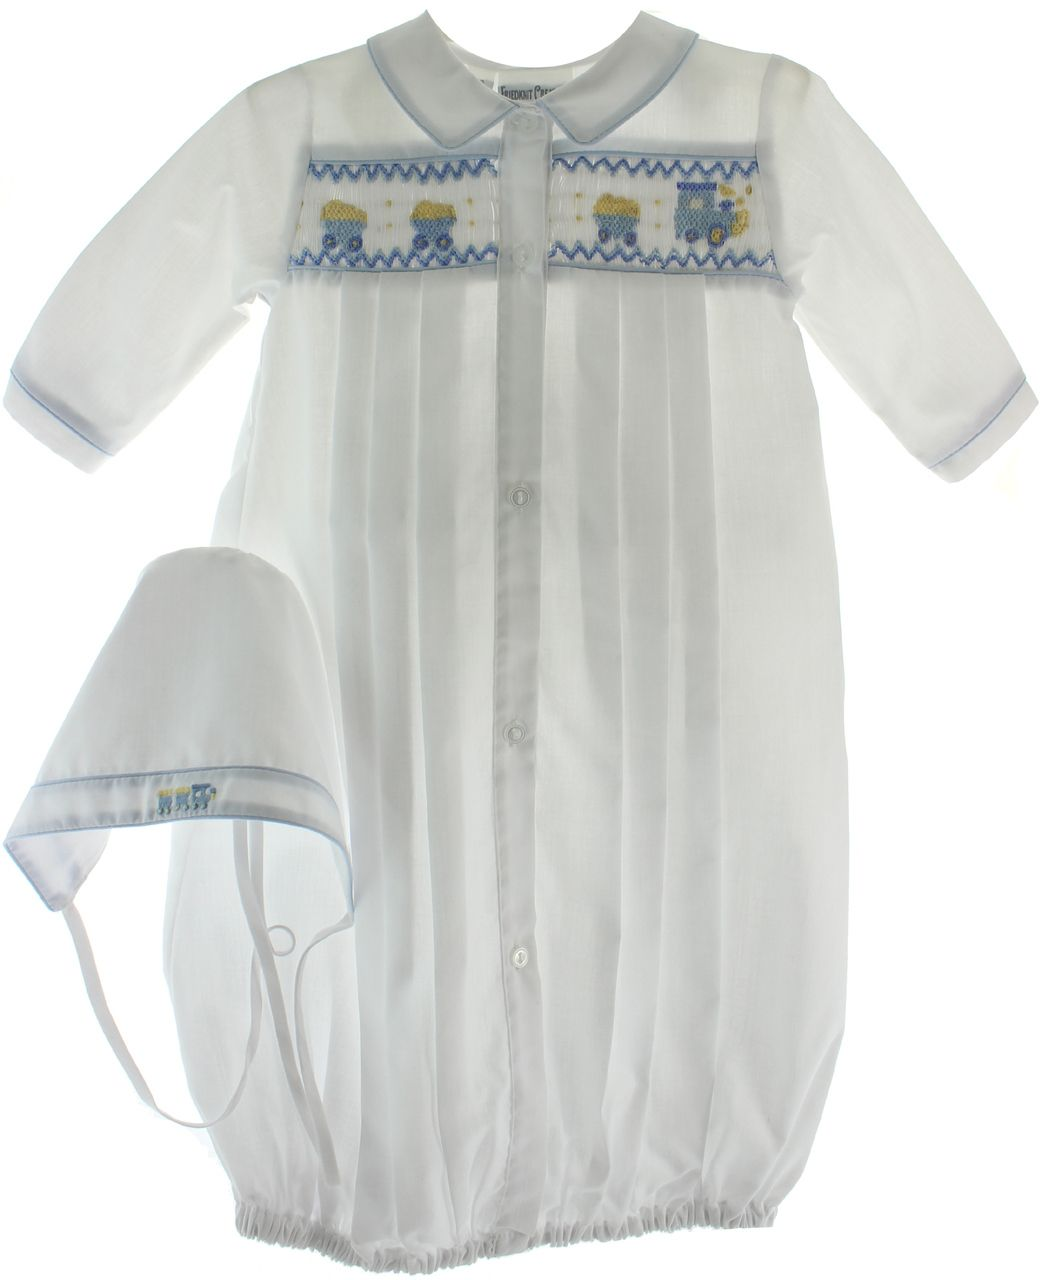 Newborn Boys White Layette Gown Train Smocking   Newborn Boys Take ...